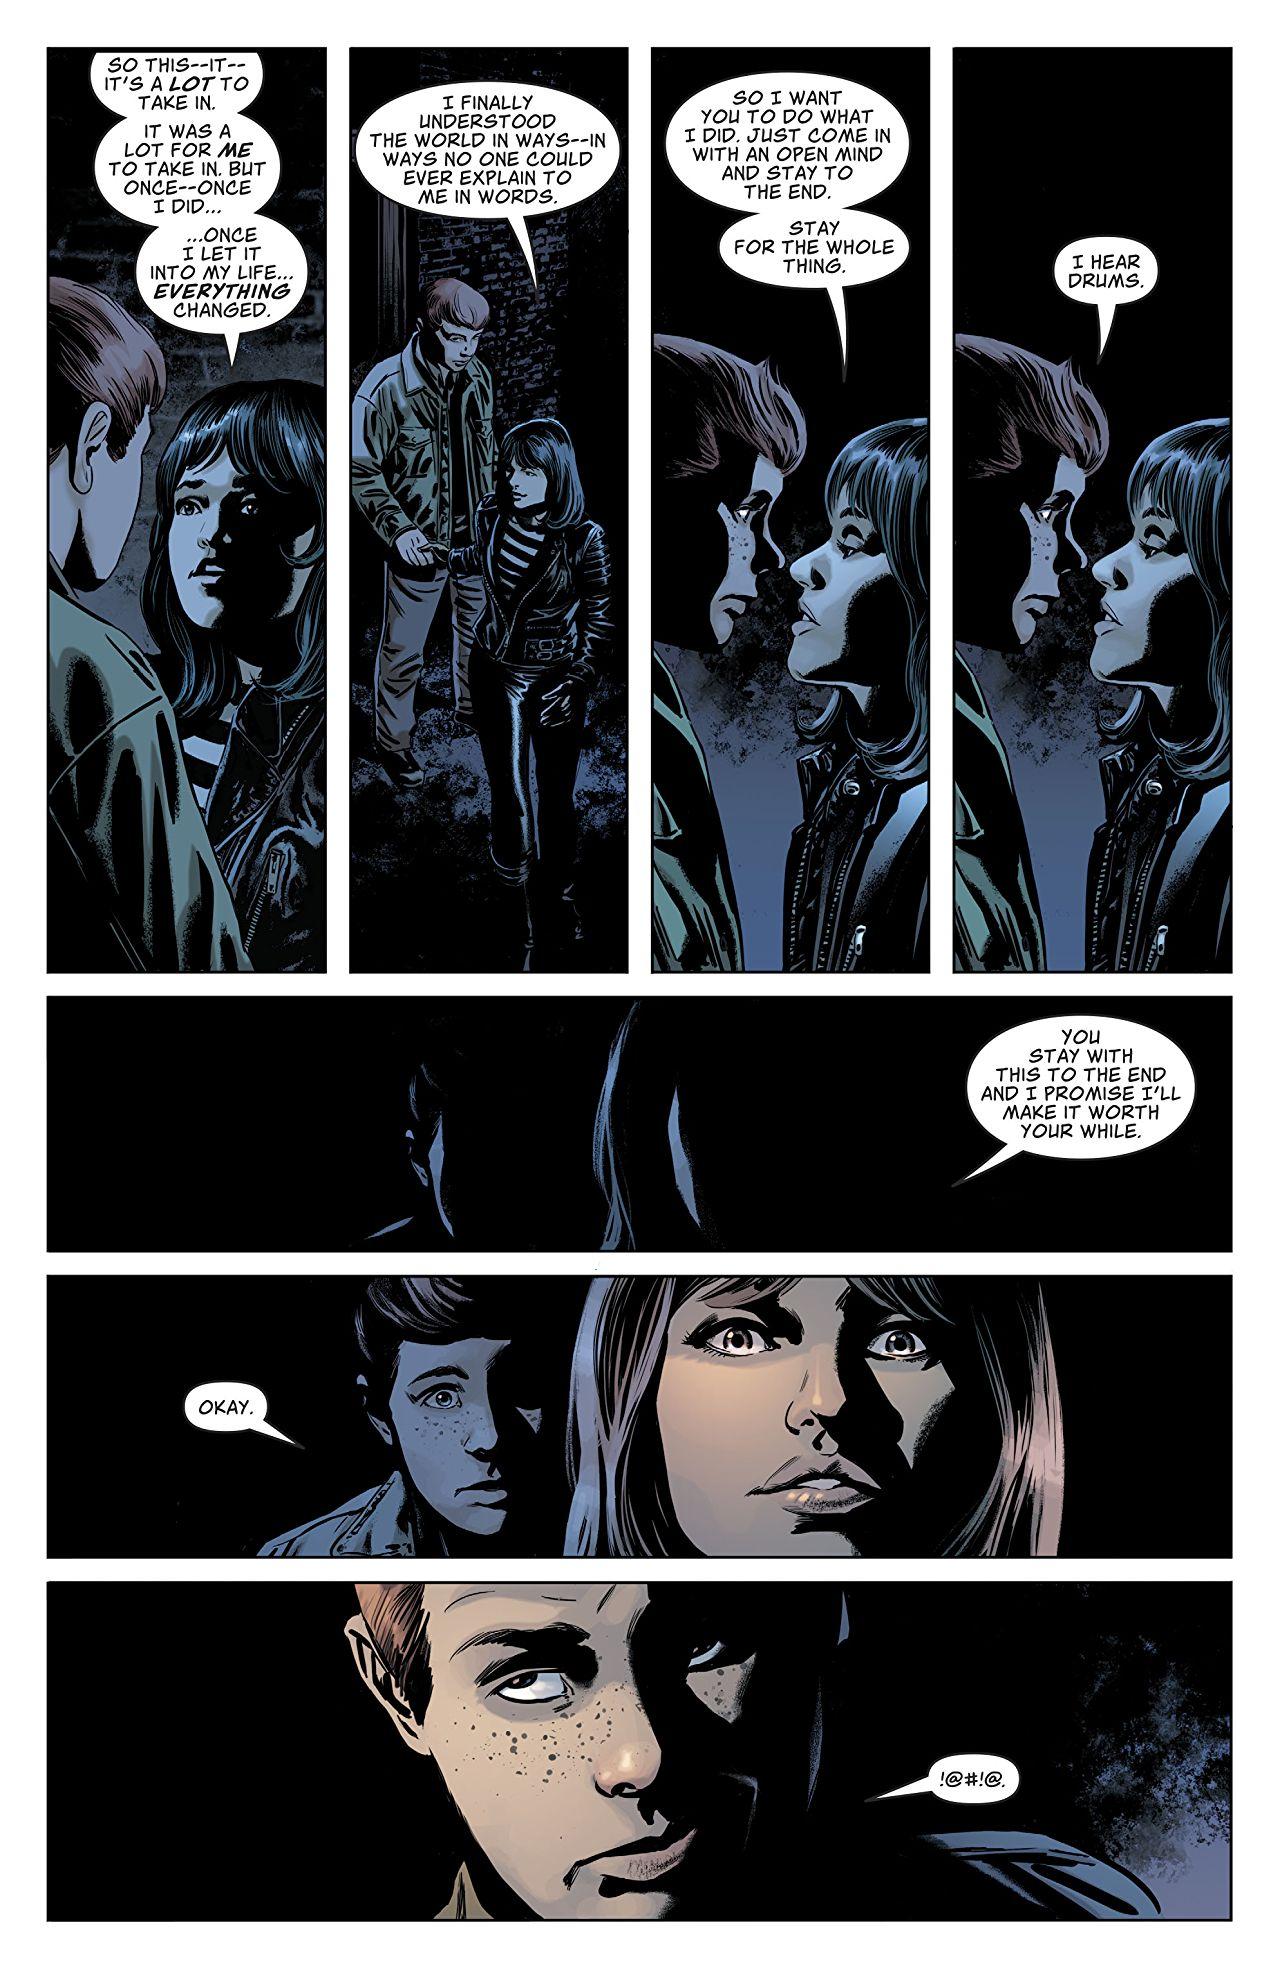 Action Comics 1007 3.jpg